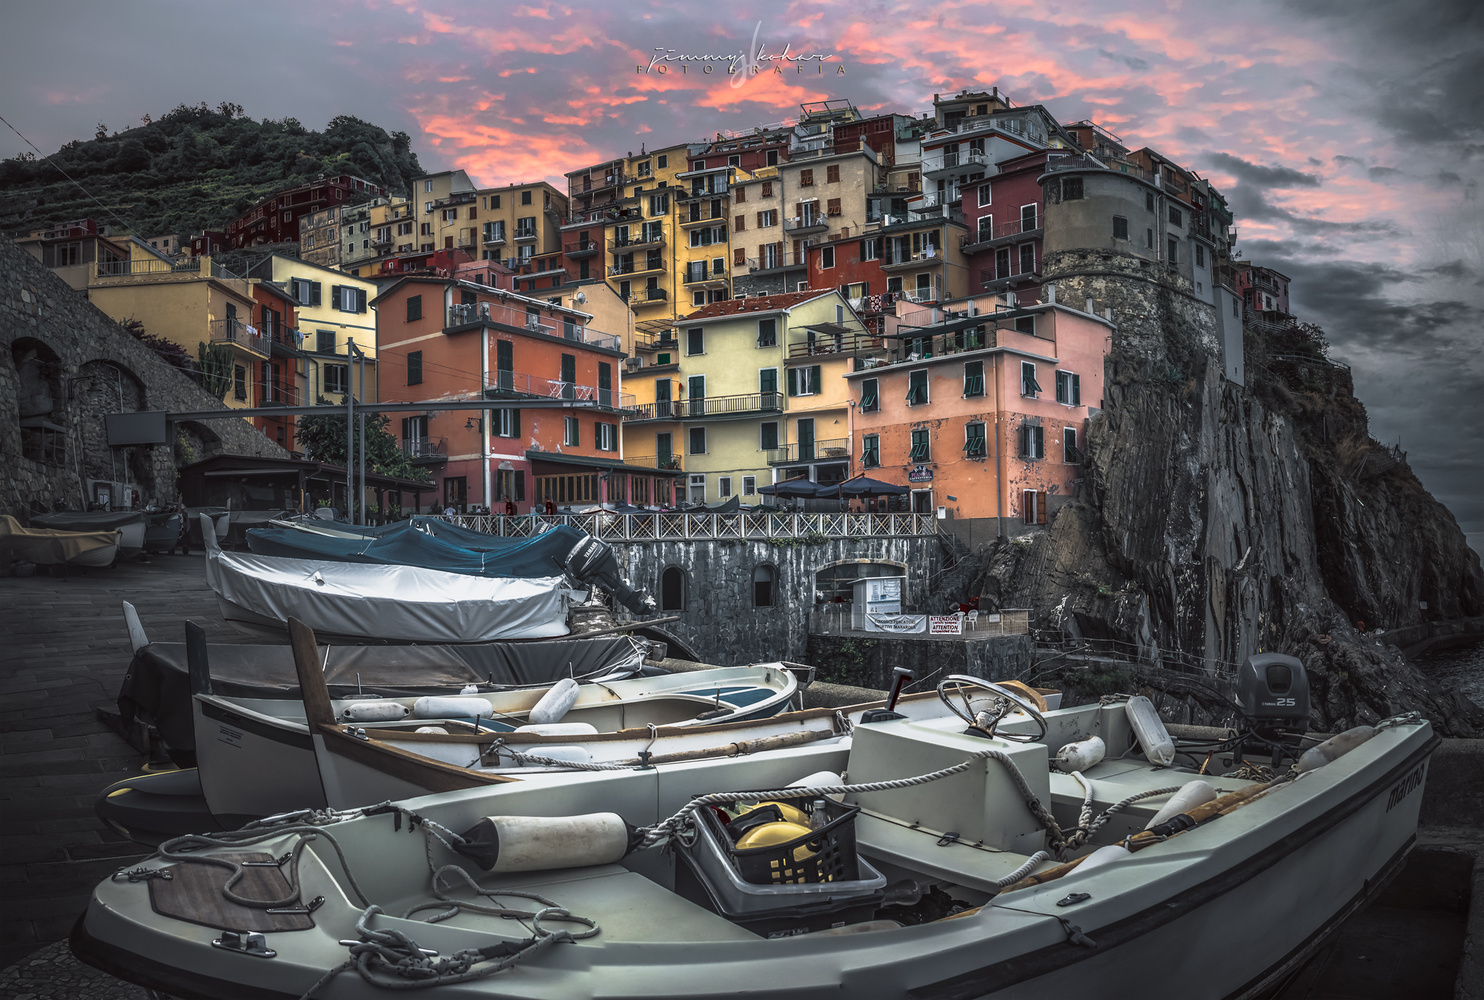 The Fishing Village by Jimmy Kohar